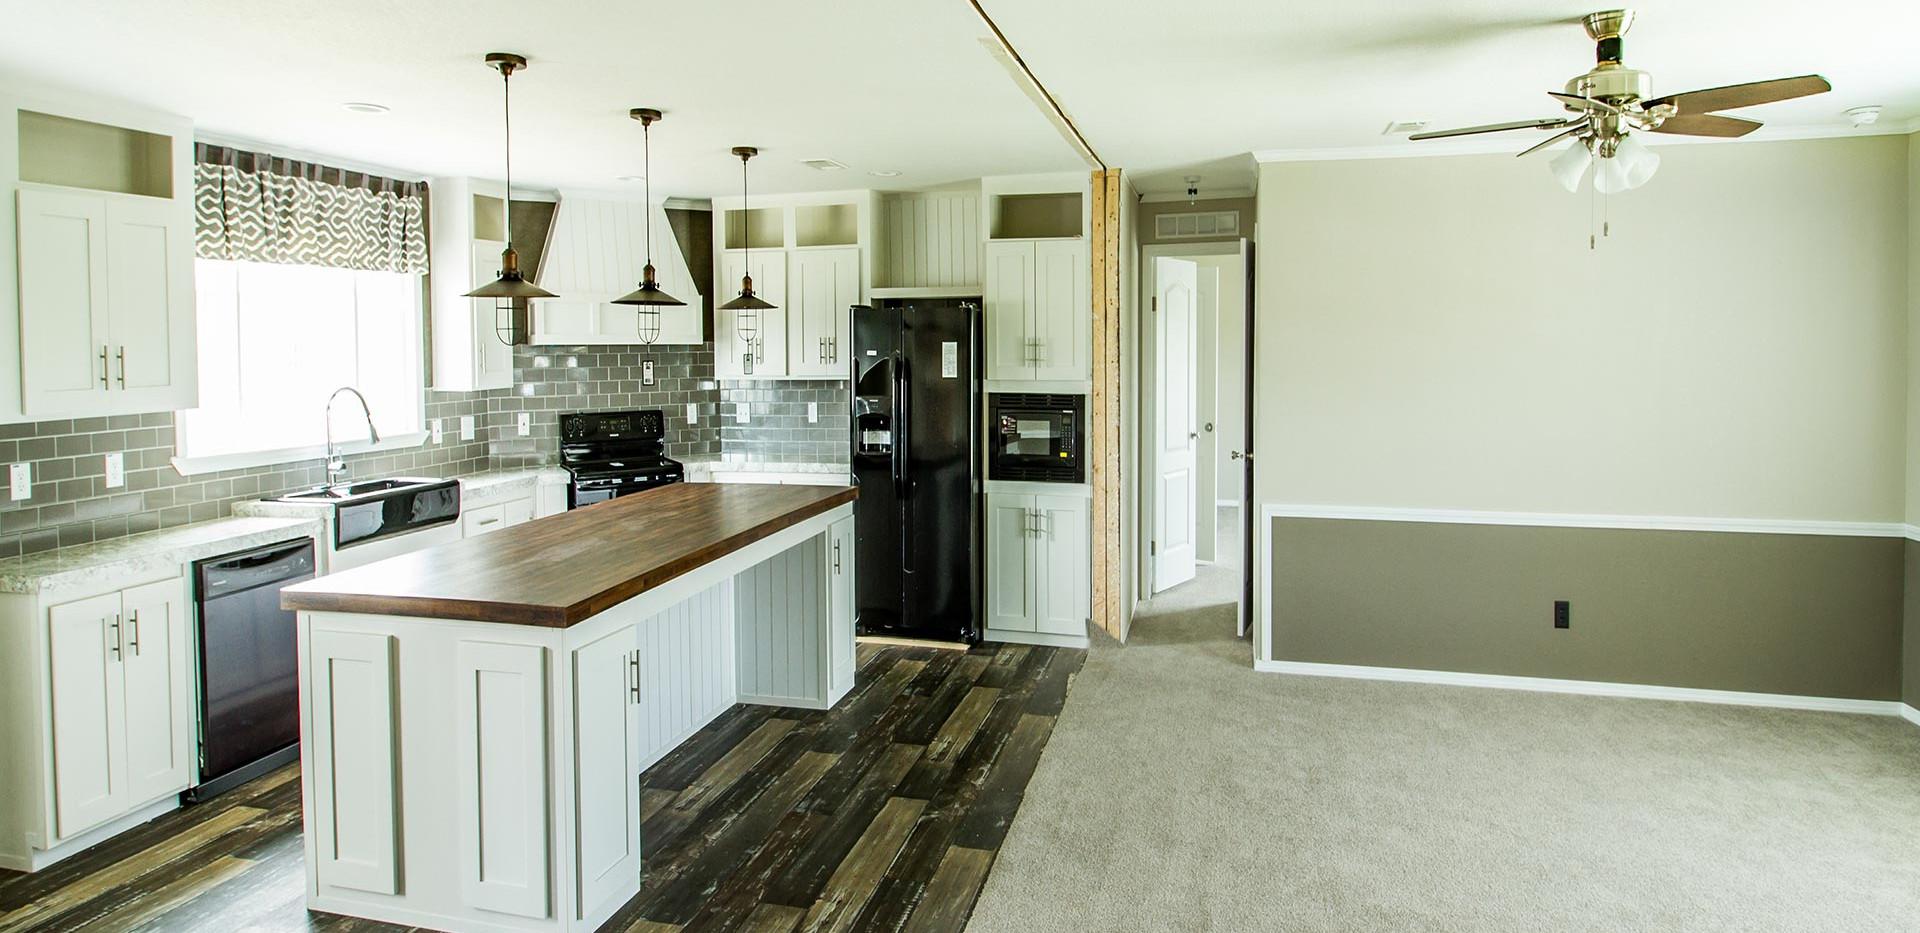 Fossil-Creek-The-Drake-kitchen-6.jpg